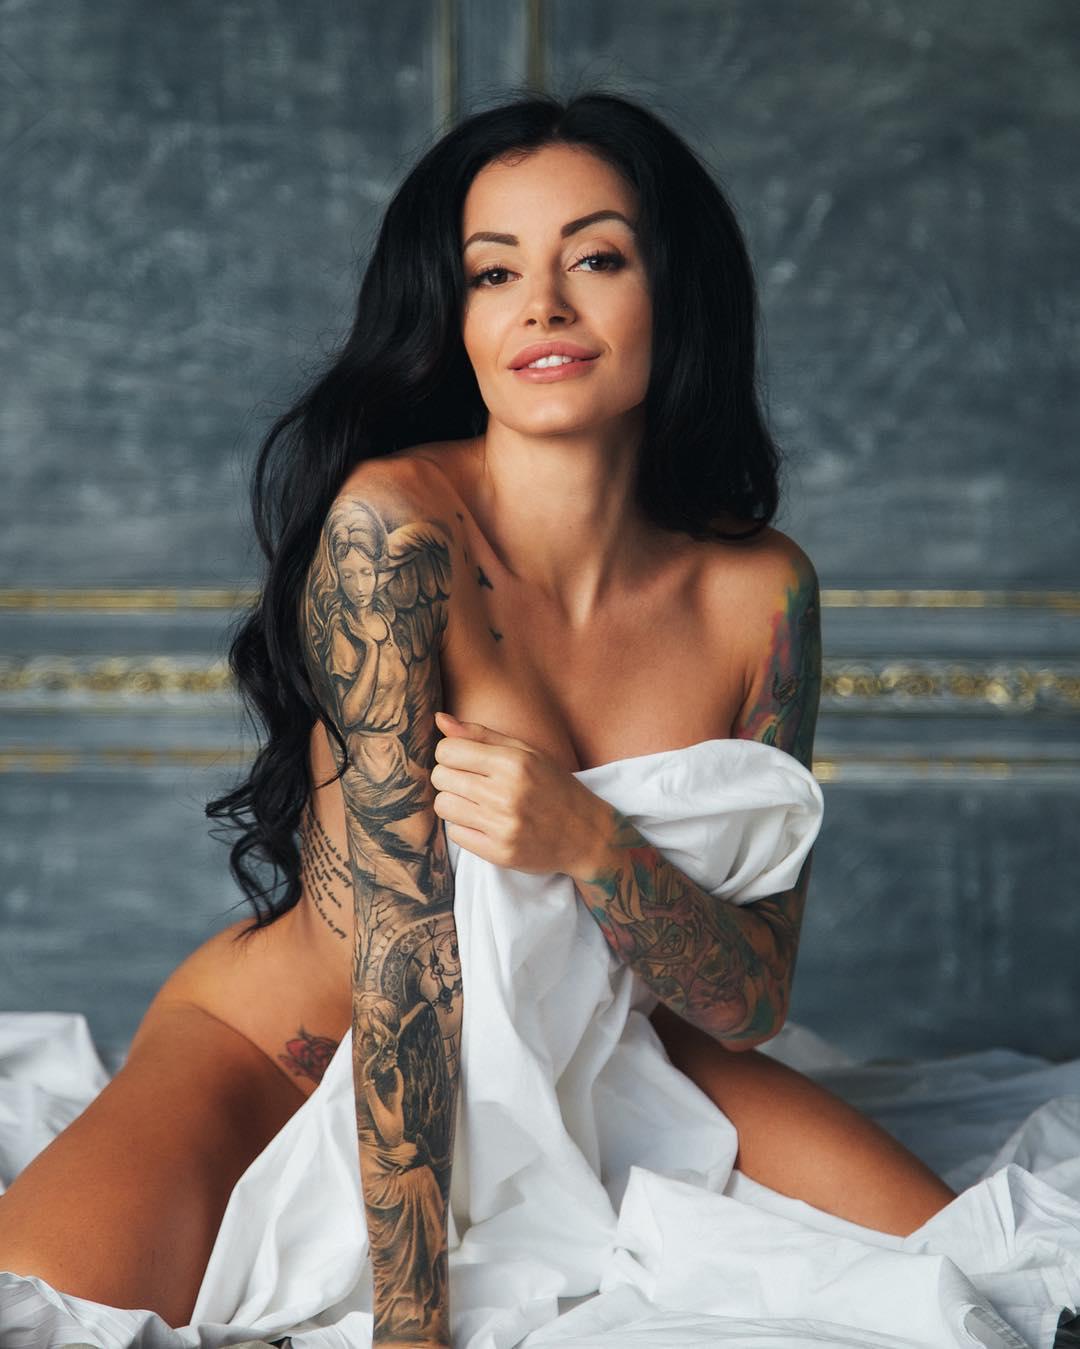 Anya Sugar - ПоЗиТиФфЧиК - сайт позитивного настроения!